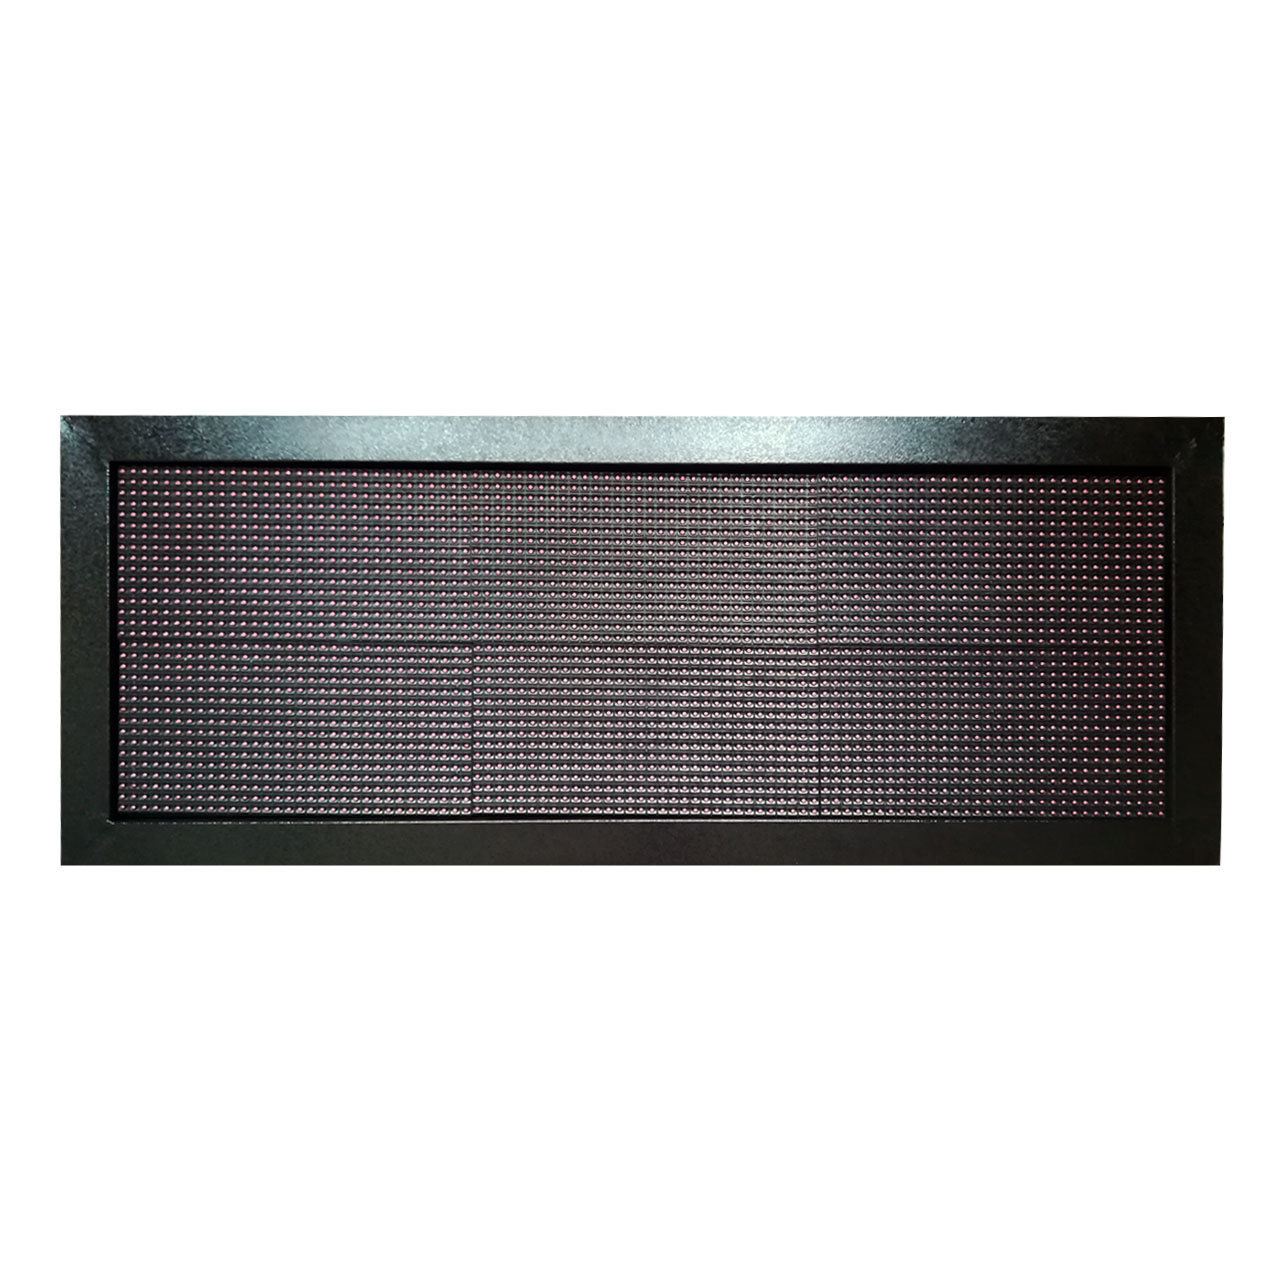 تابلو ال ای دی آراویژن مدل ITHD10642 806AW